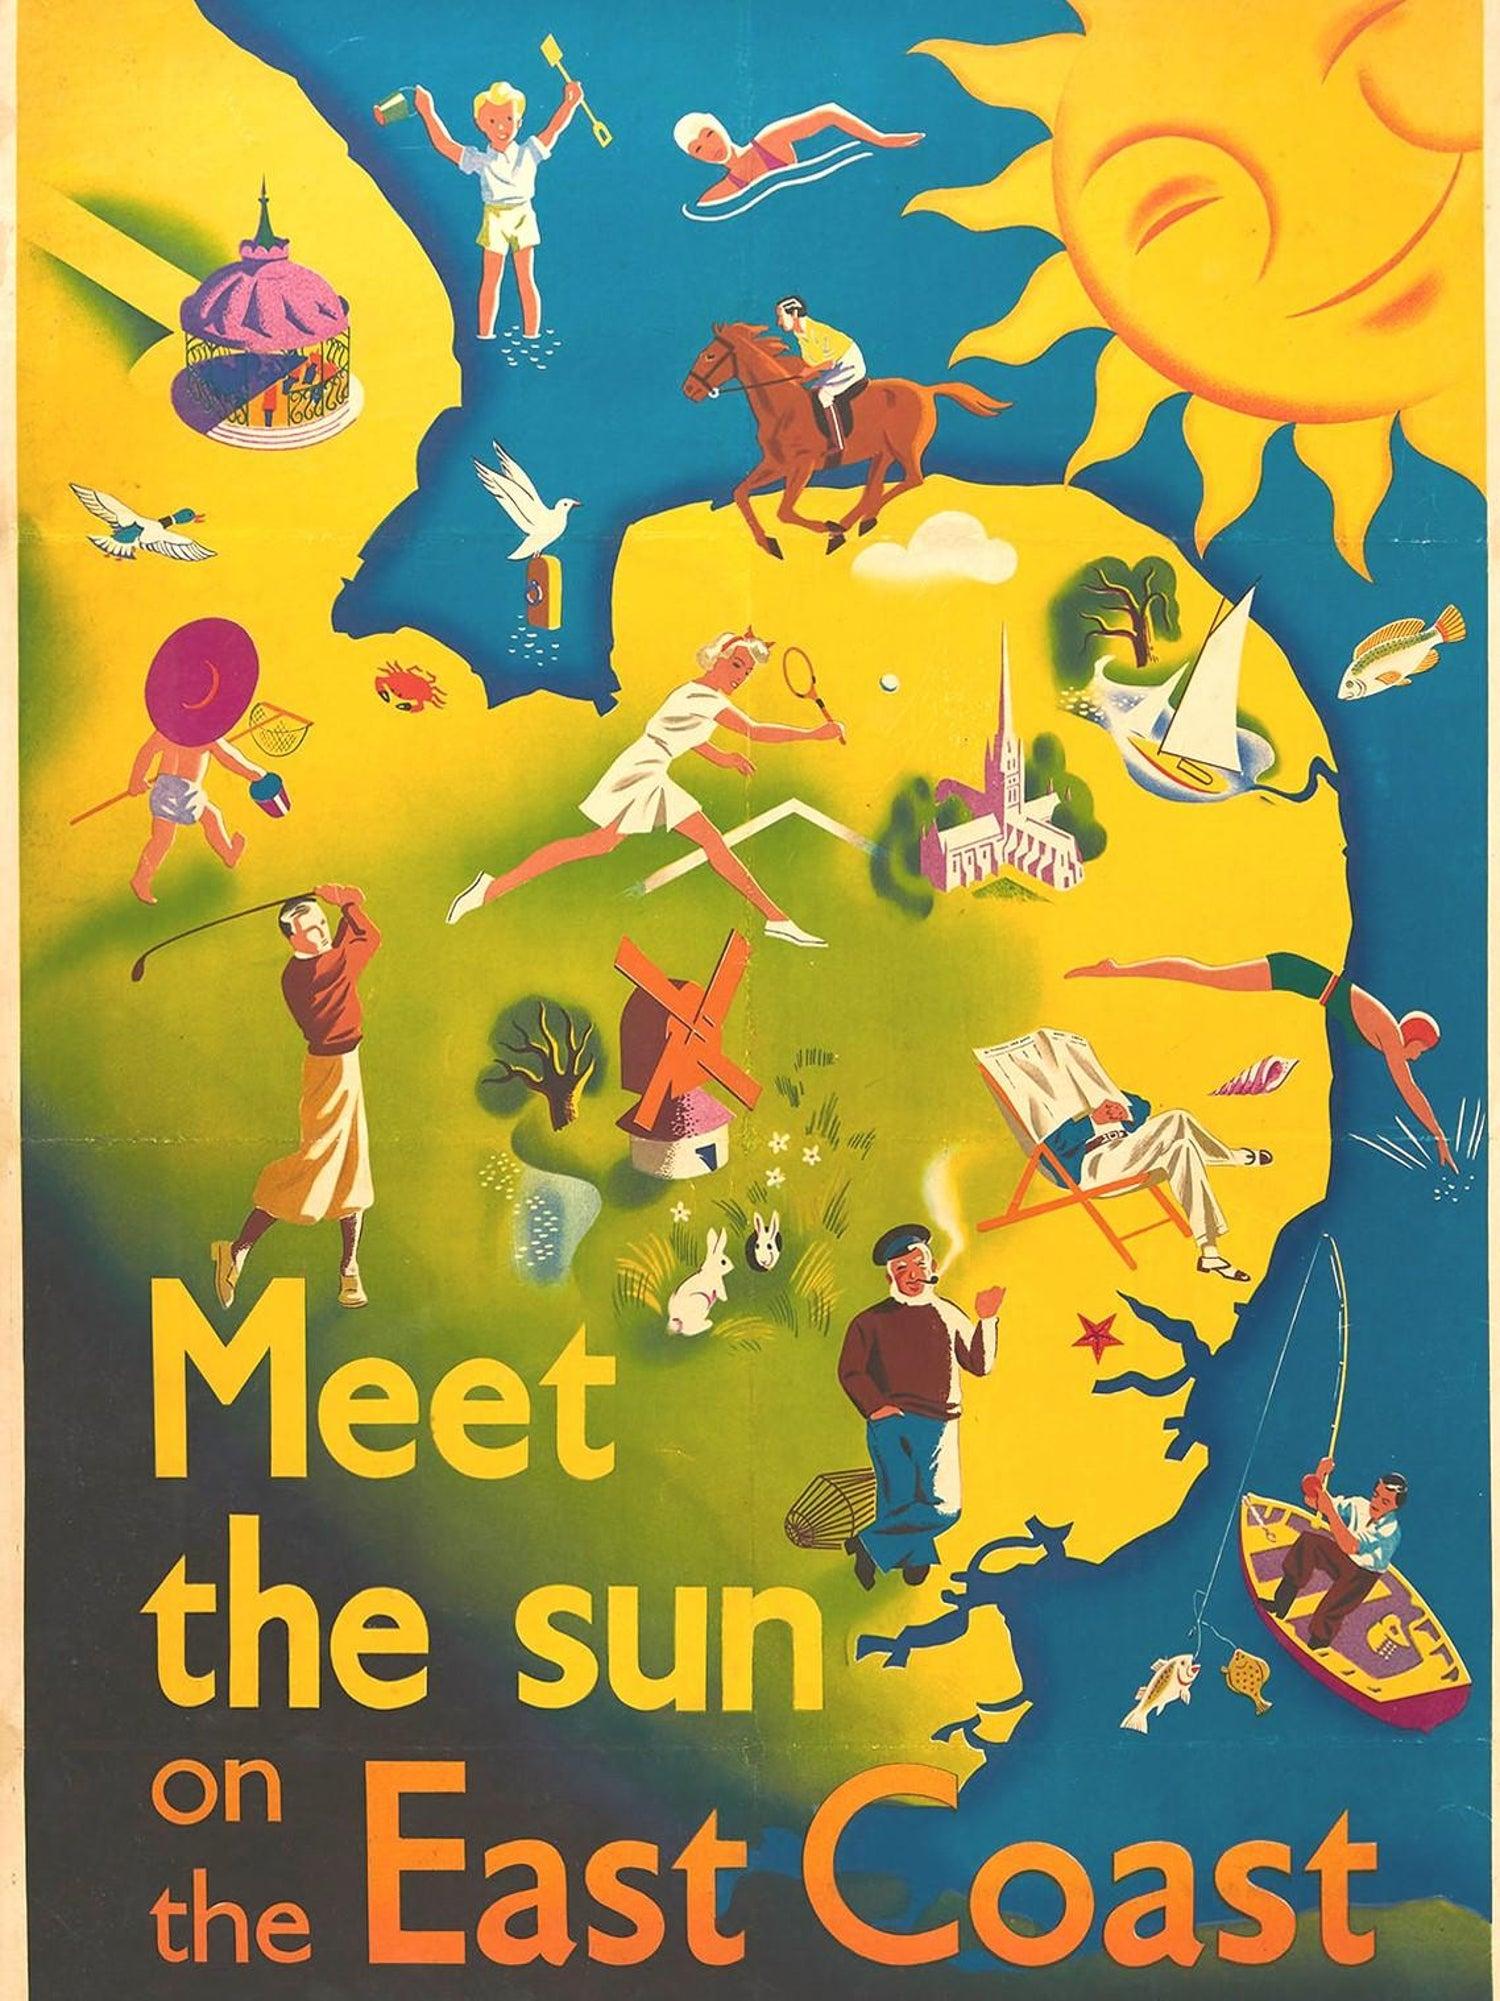 189 Vintage Railway Art Poster Port Sunlight